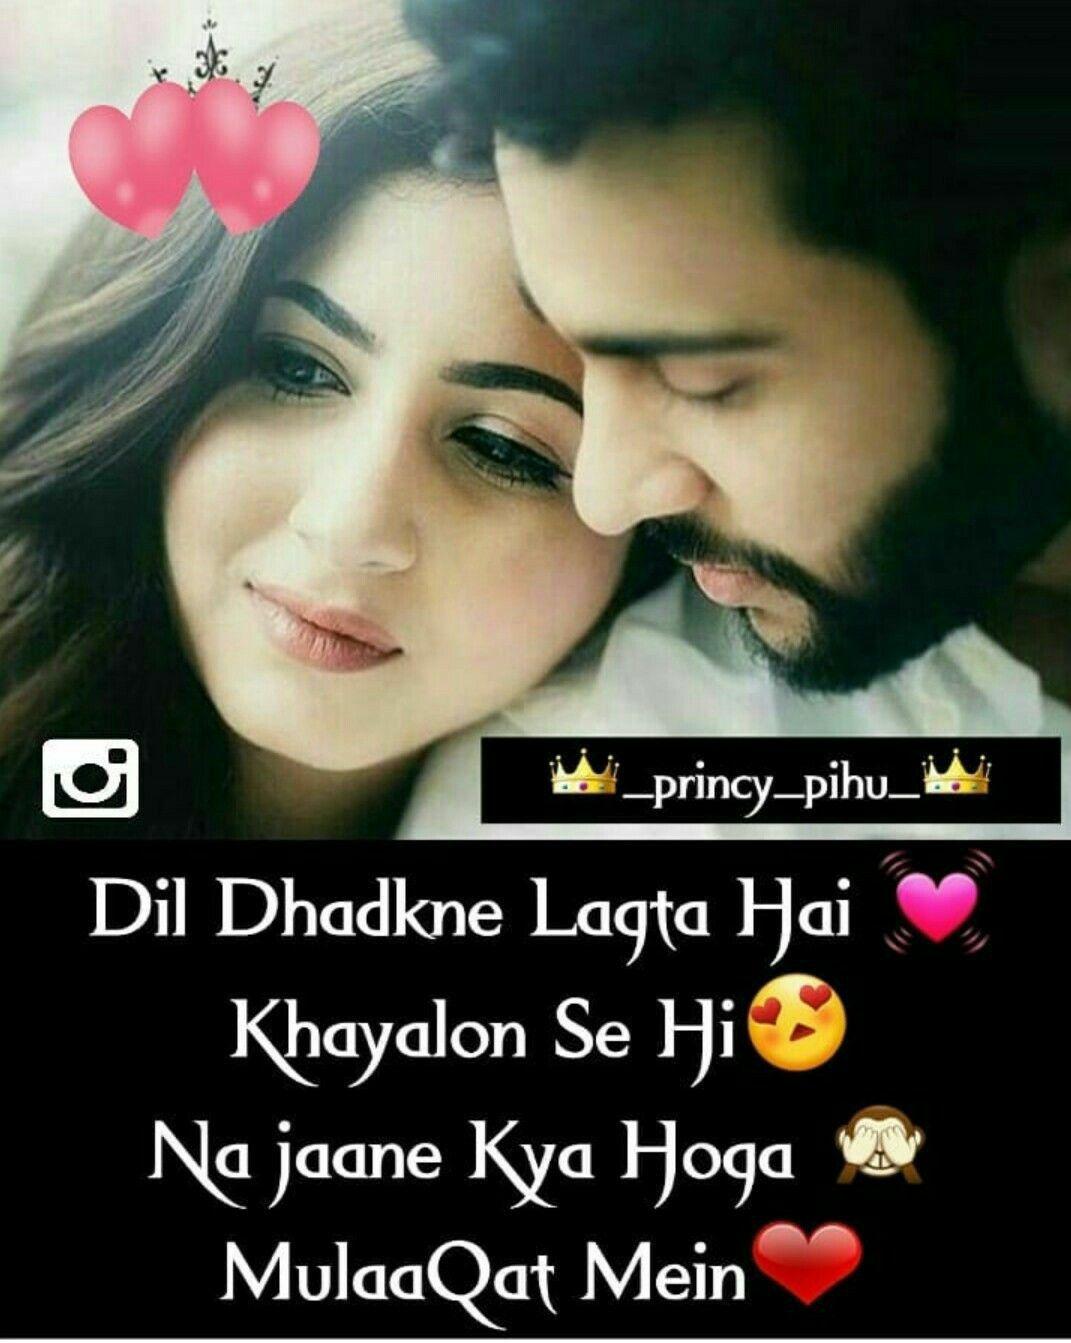 Quotes On Love Best Love Quotes Punjabi Love Quotes Romantic Love Quotes True Love Quotes